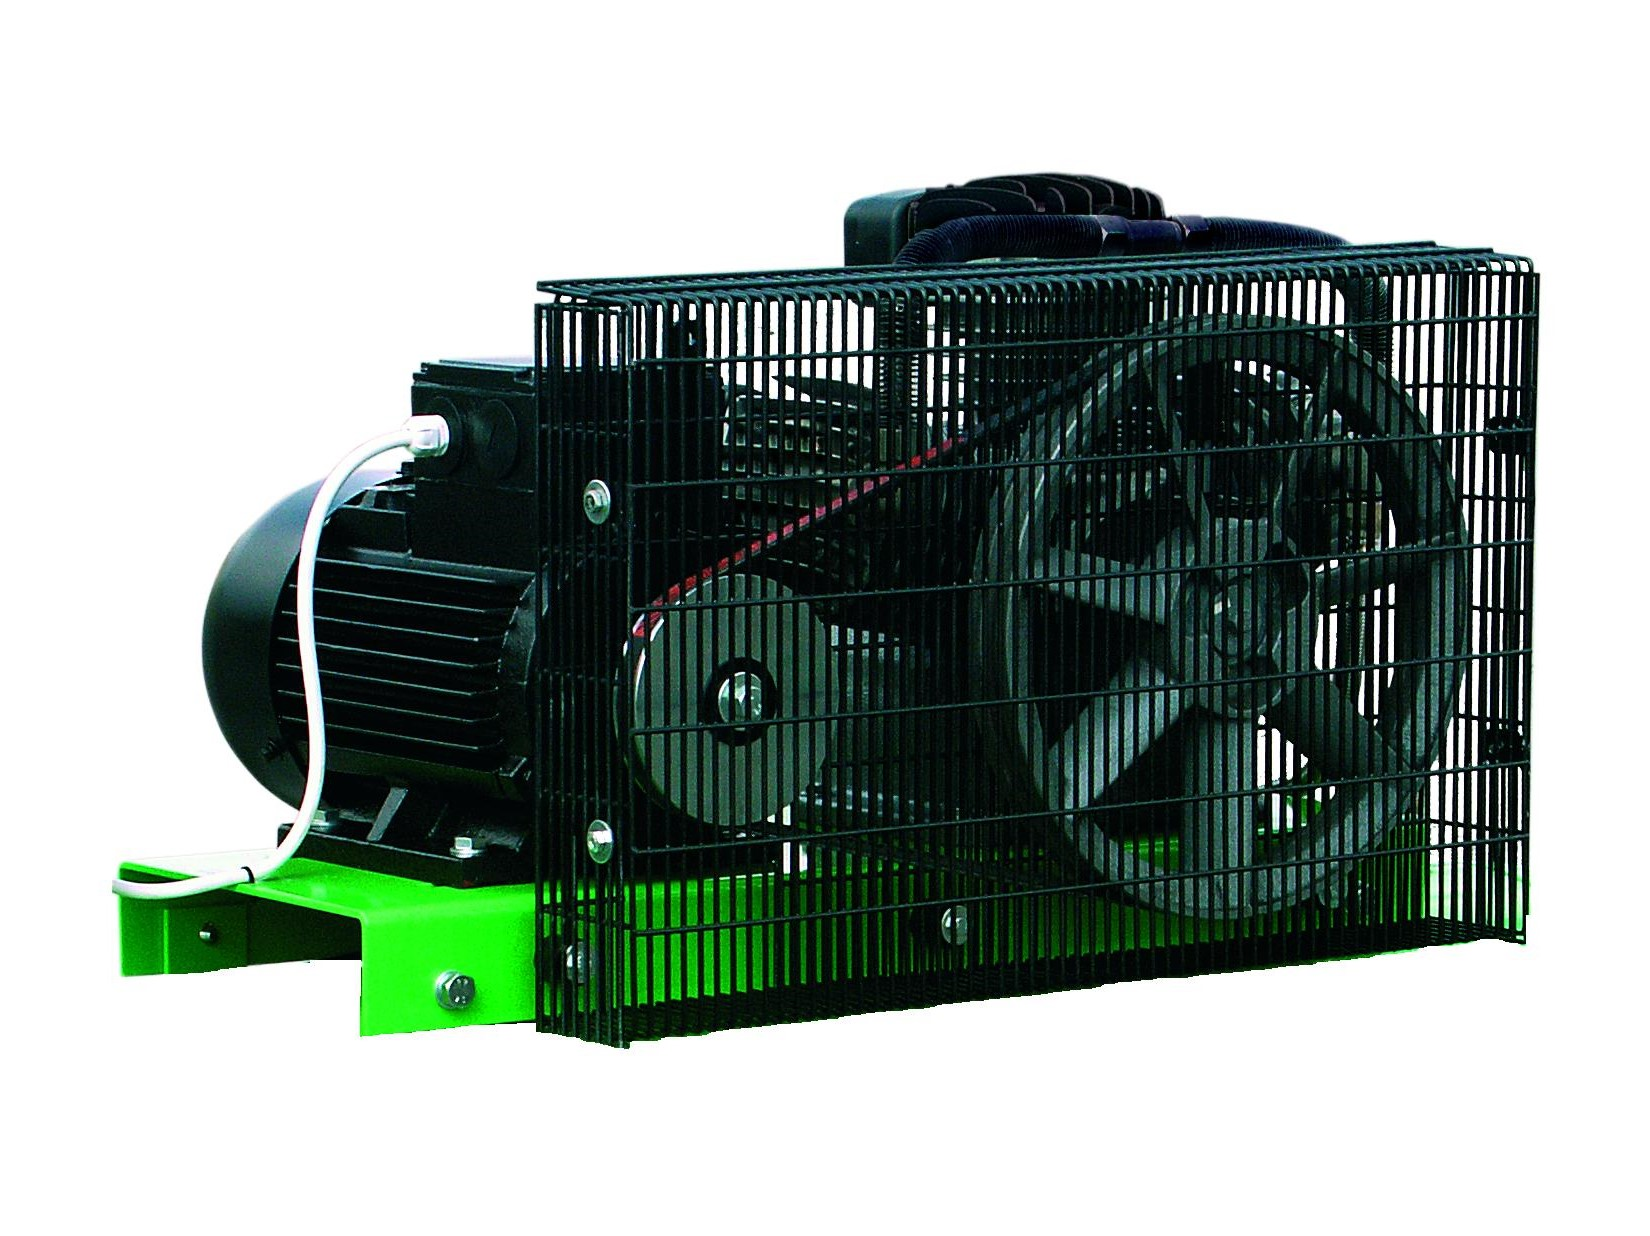 Atmos Pístový kompresor Perfect - 4TPFT